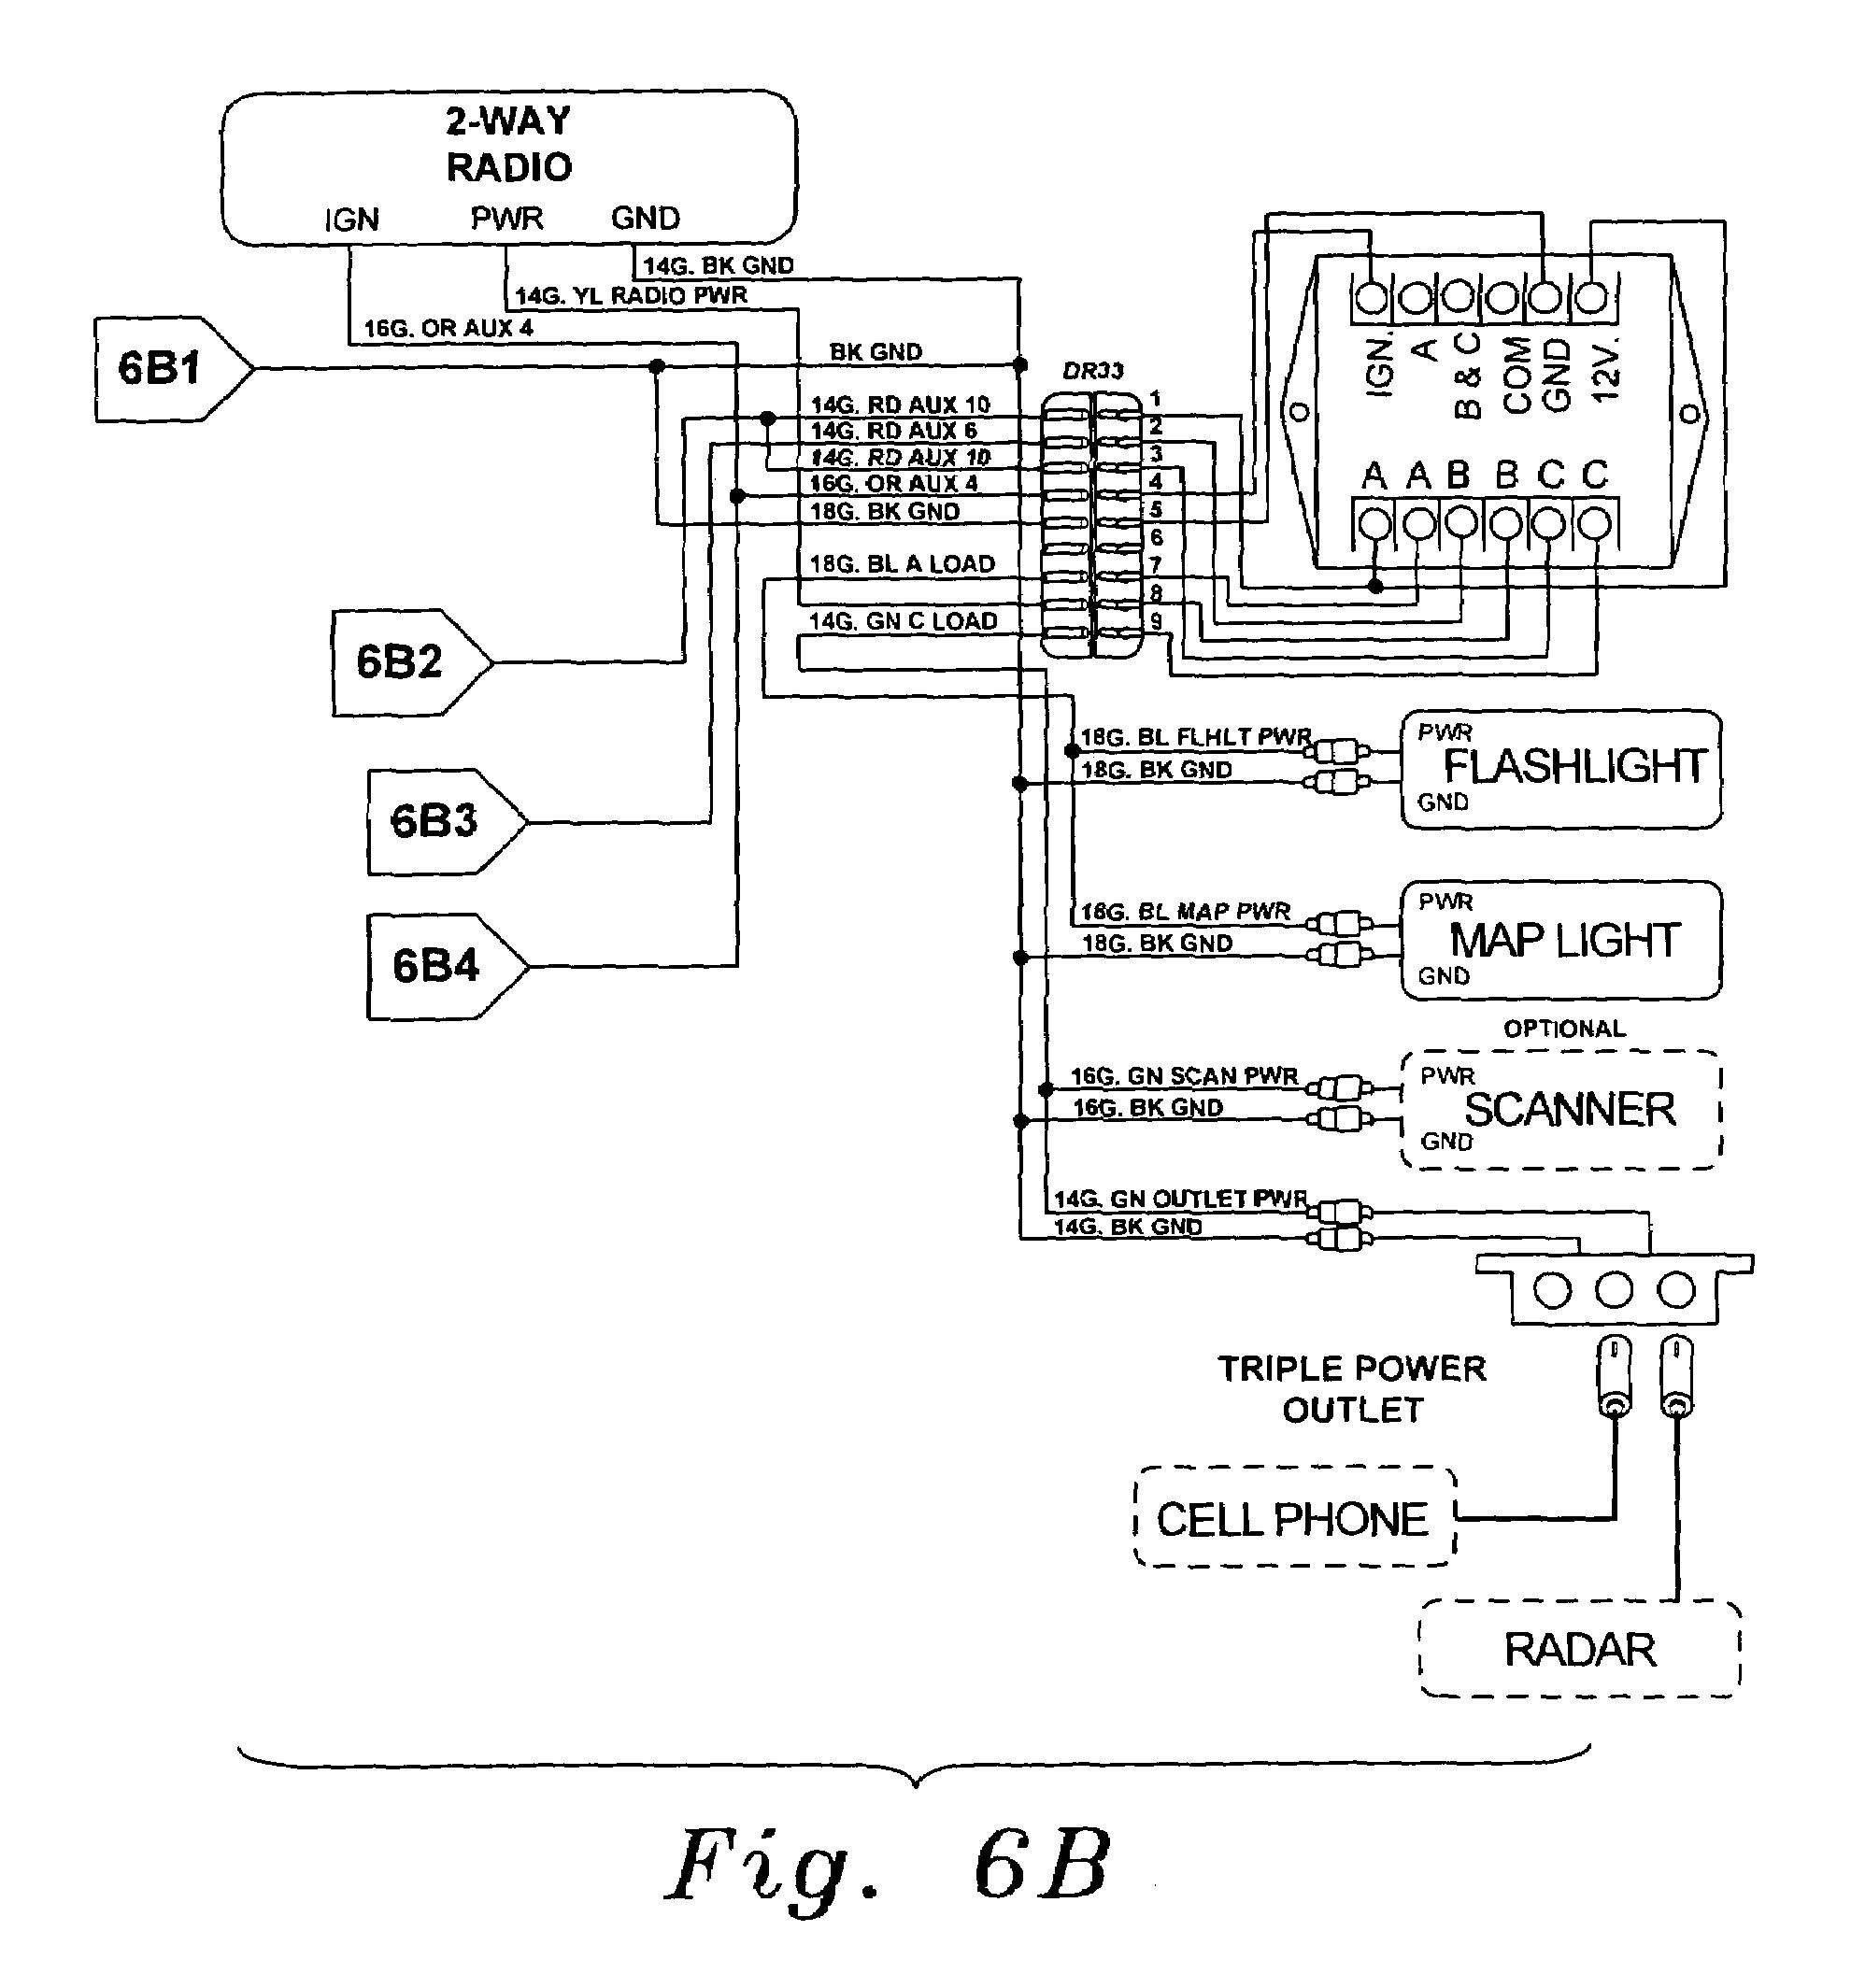 Fire Alarm Horn Strobe Wiring Diagram Best Of Wiring Diagram Image